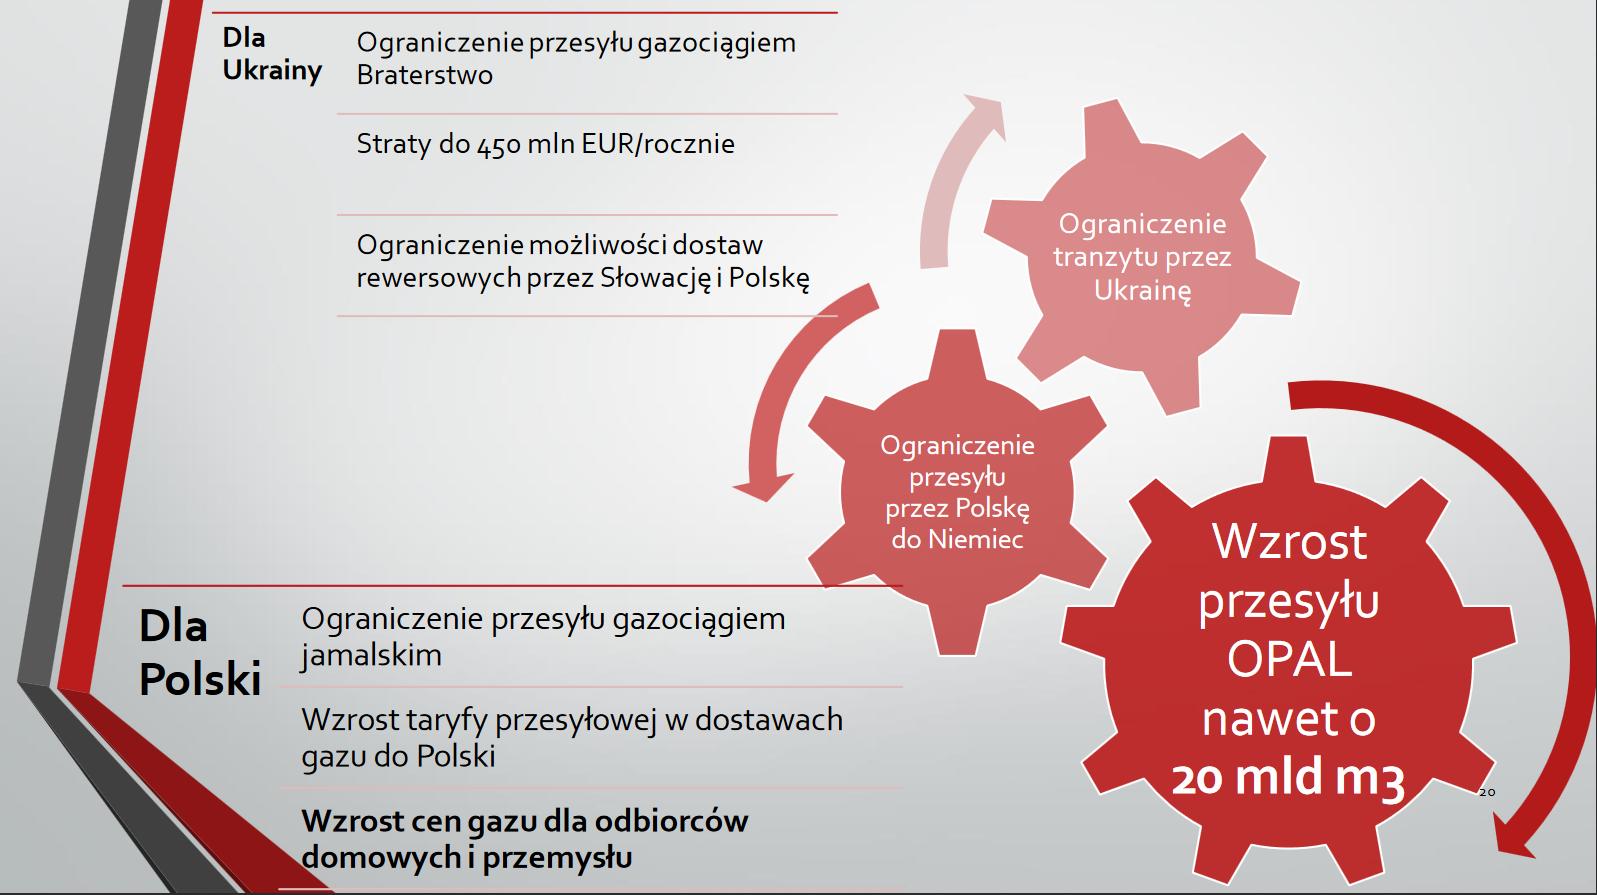 Skutki decyzji ws. OPAL dla Polski i Ukrainy. Fot. BiznesAlert.pl